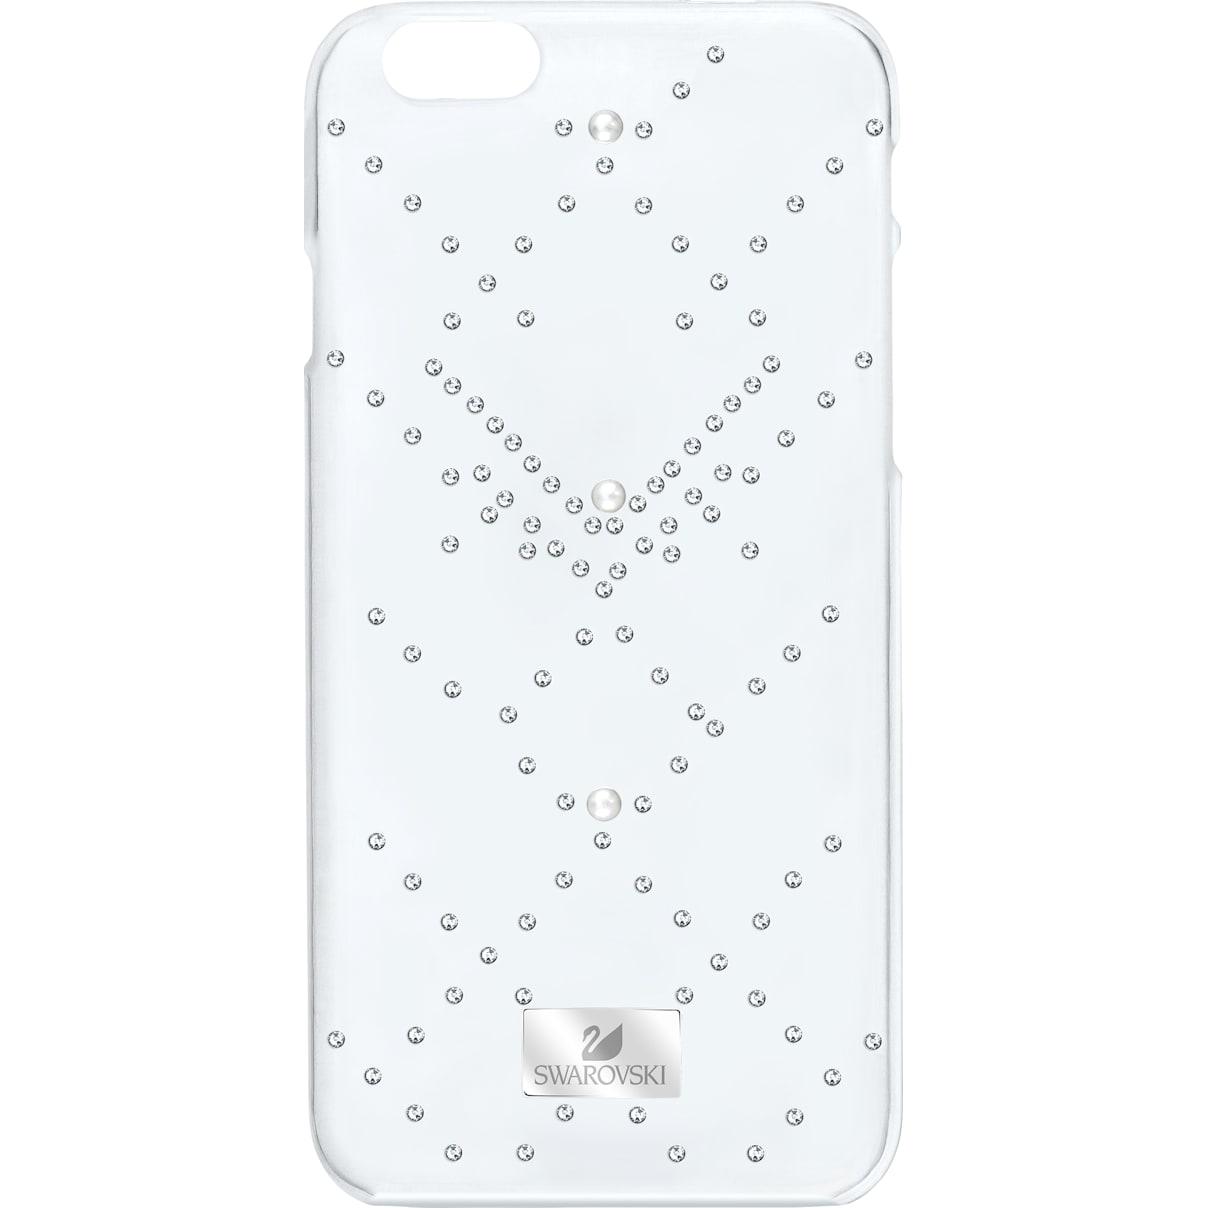 Swarovski Edify Smartphone Case with Bumper, iPhone® 7 Plus